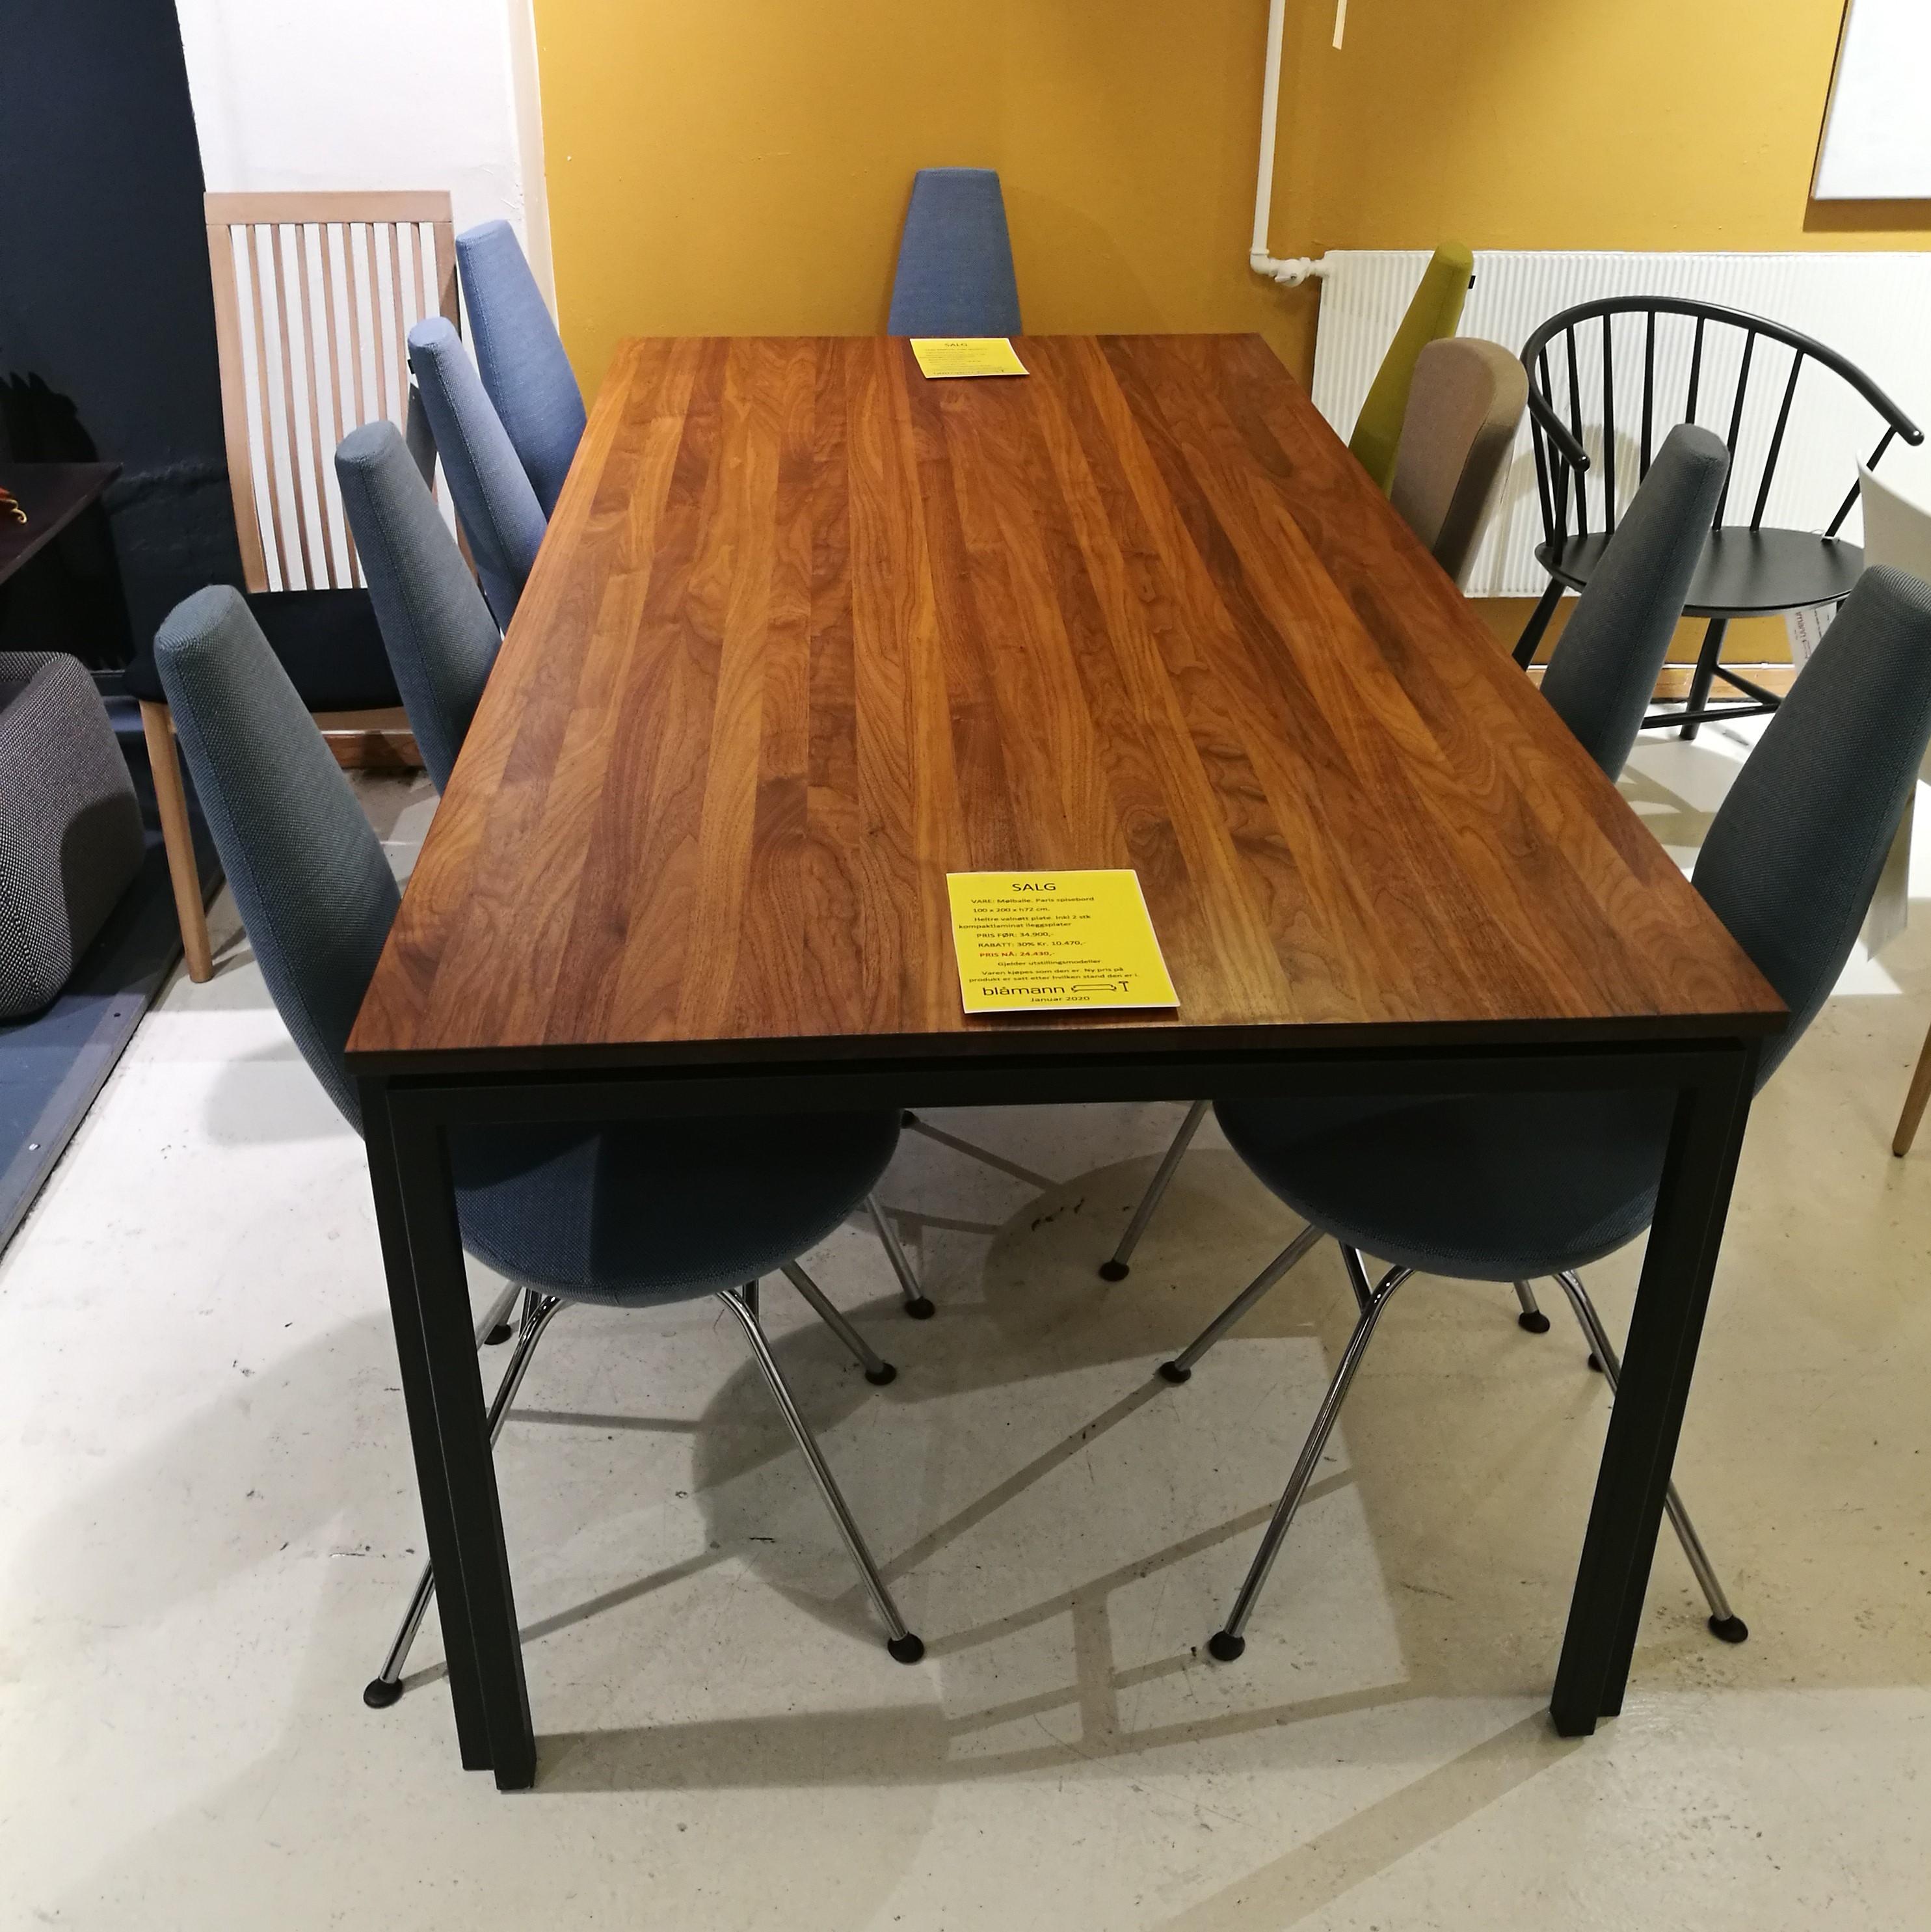 40% Moroso – Fjord stol | Blåmann Møbler